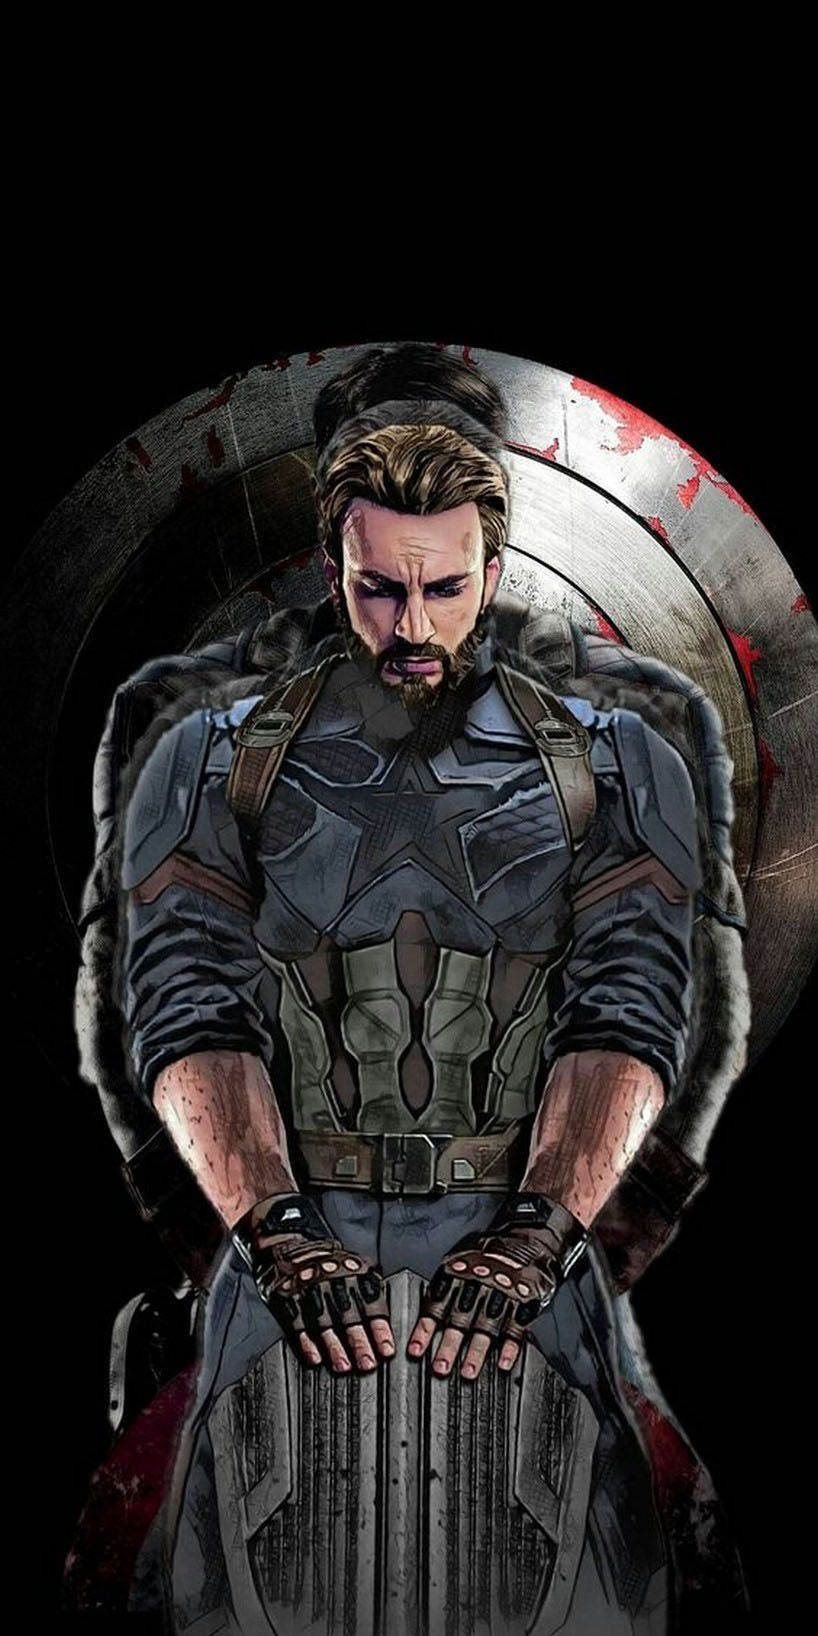 Captain America Wallpaper 4k Captain America Wallpaper Captain America Art Marvel Superhero Posters